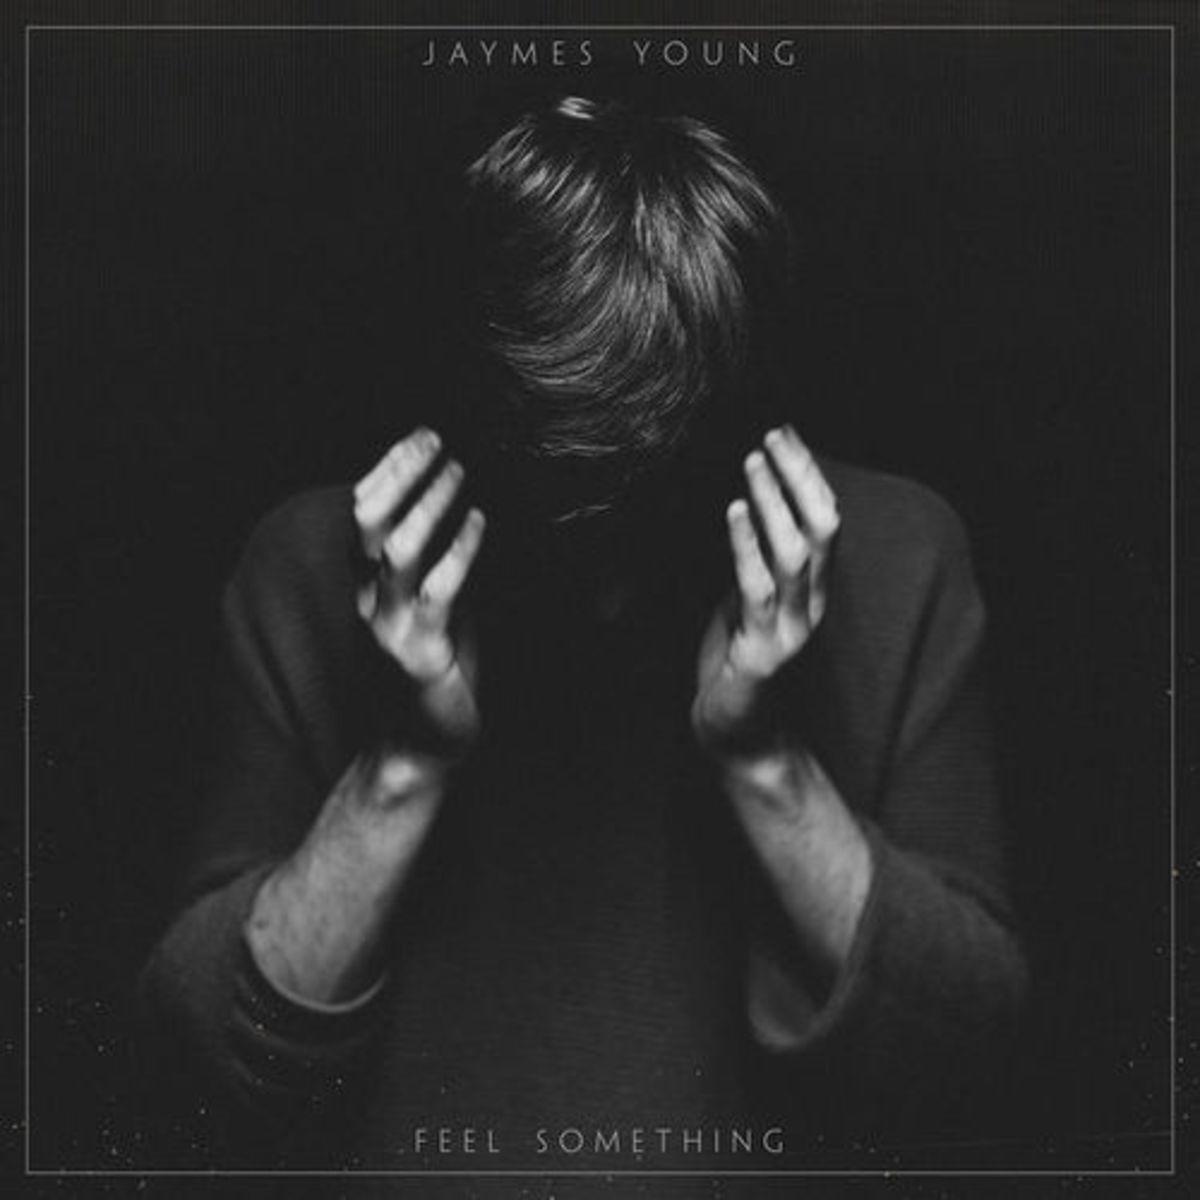 jaymes-young-feel-something.jpg